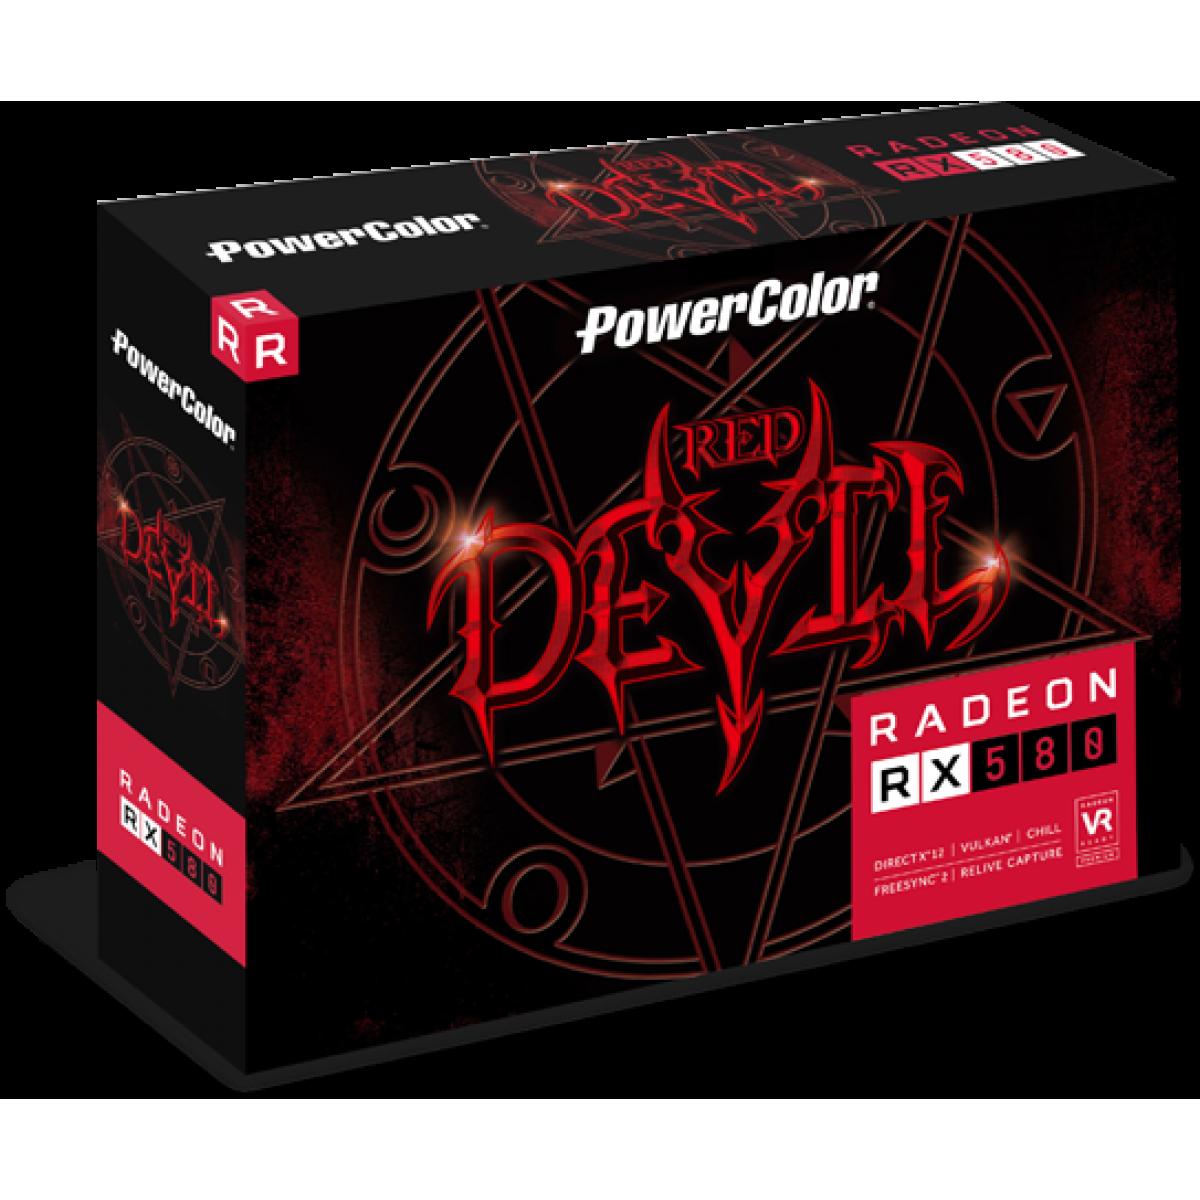 Placa de Vídeo PowerColor, Radeon, RX 580 Red Devil, Dual, 8GB, GDDR5, 256Bit, AXRX 580 8GBD5-3DH/OC